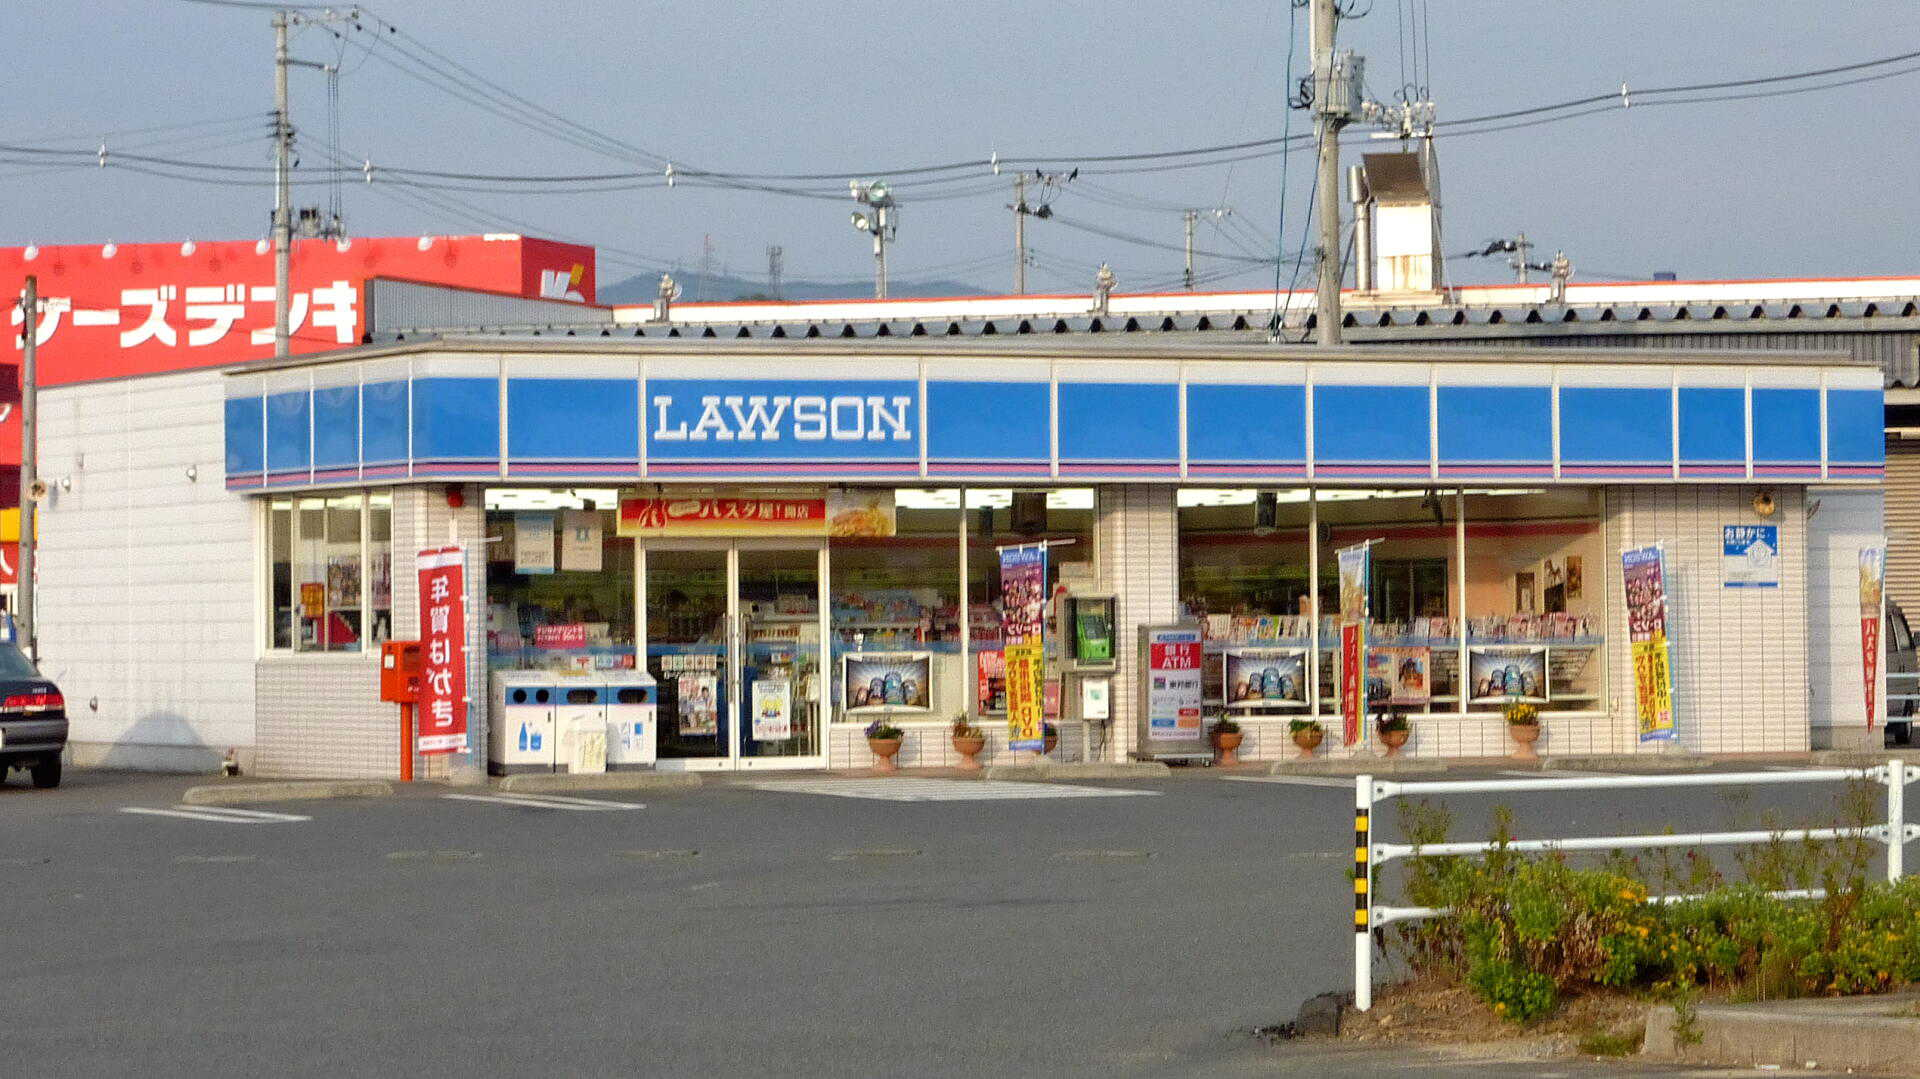 Lawson Japan